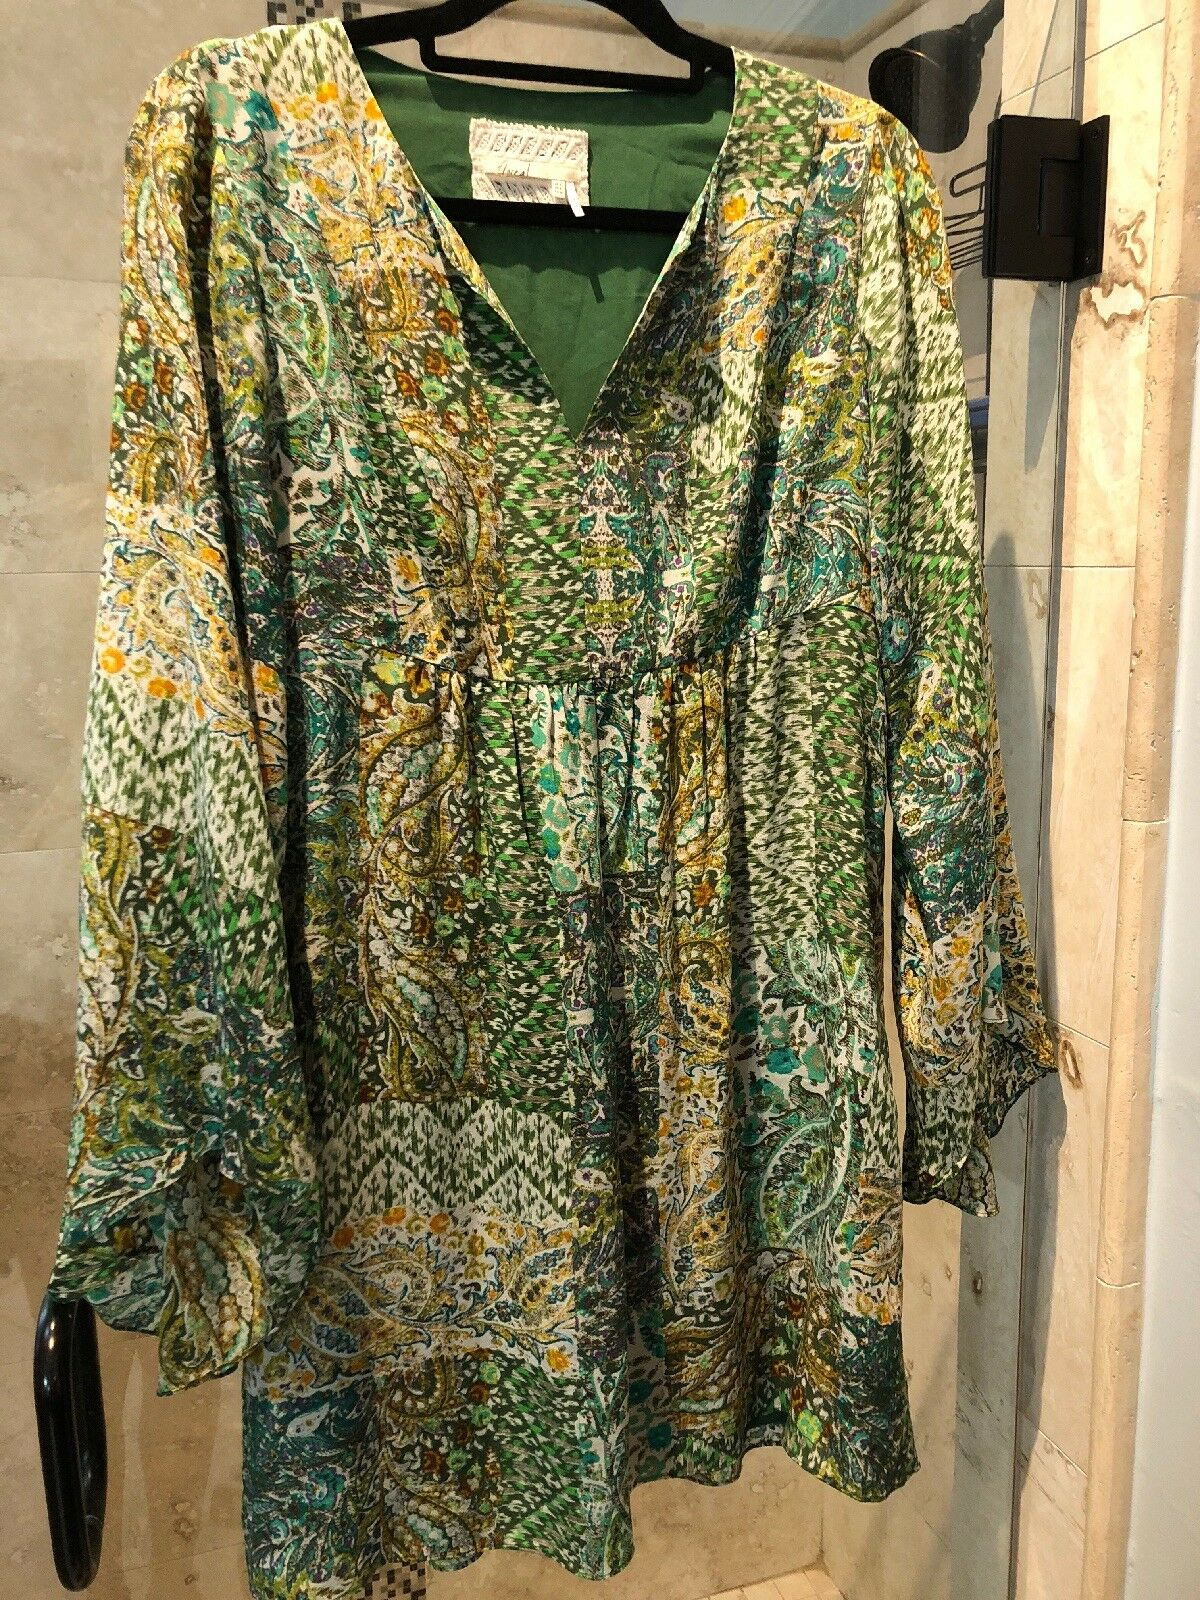 New  275 Anthropologie Anthropologie Anthropologie Floreat Silk Kimono Sleeve Green Paisley Dress s Small 4 370314